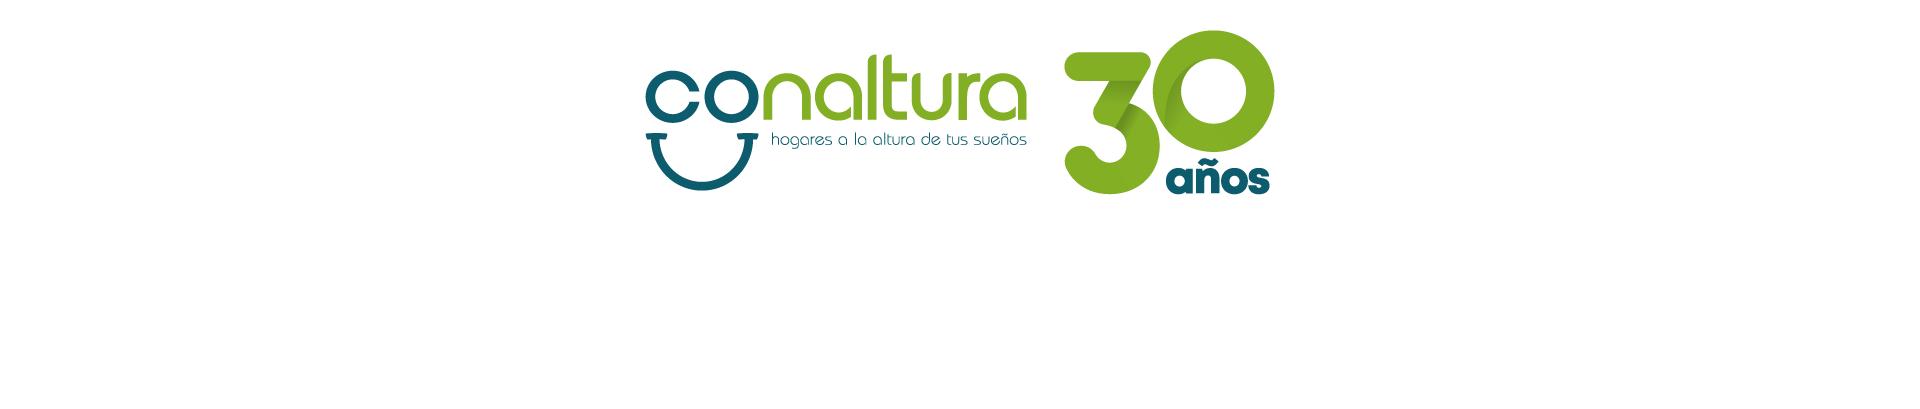 logo-conaltura-Jun-25-2020-04-40-36-64-PM